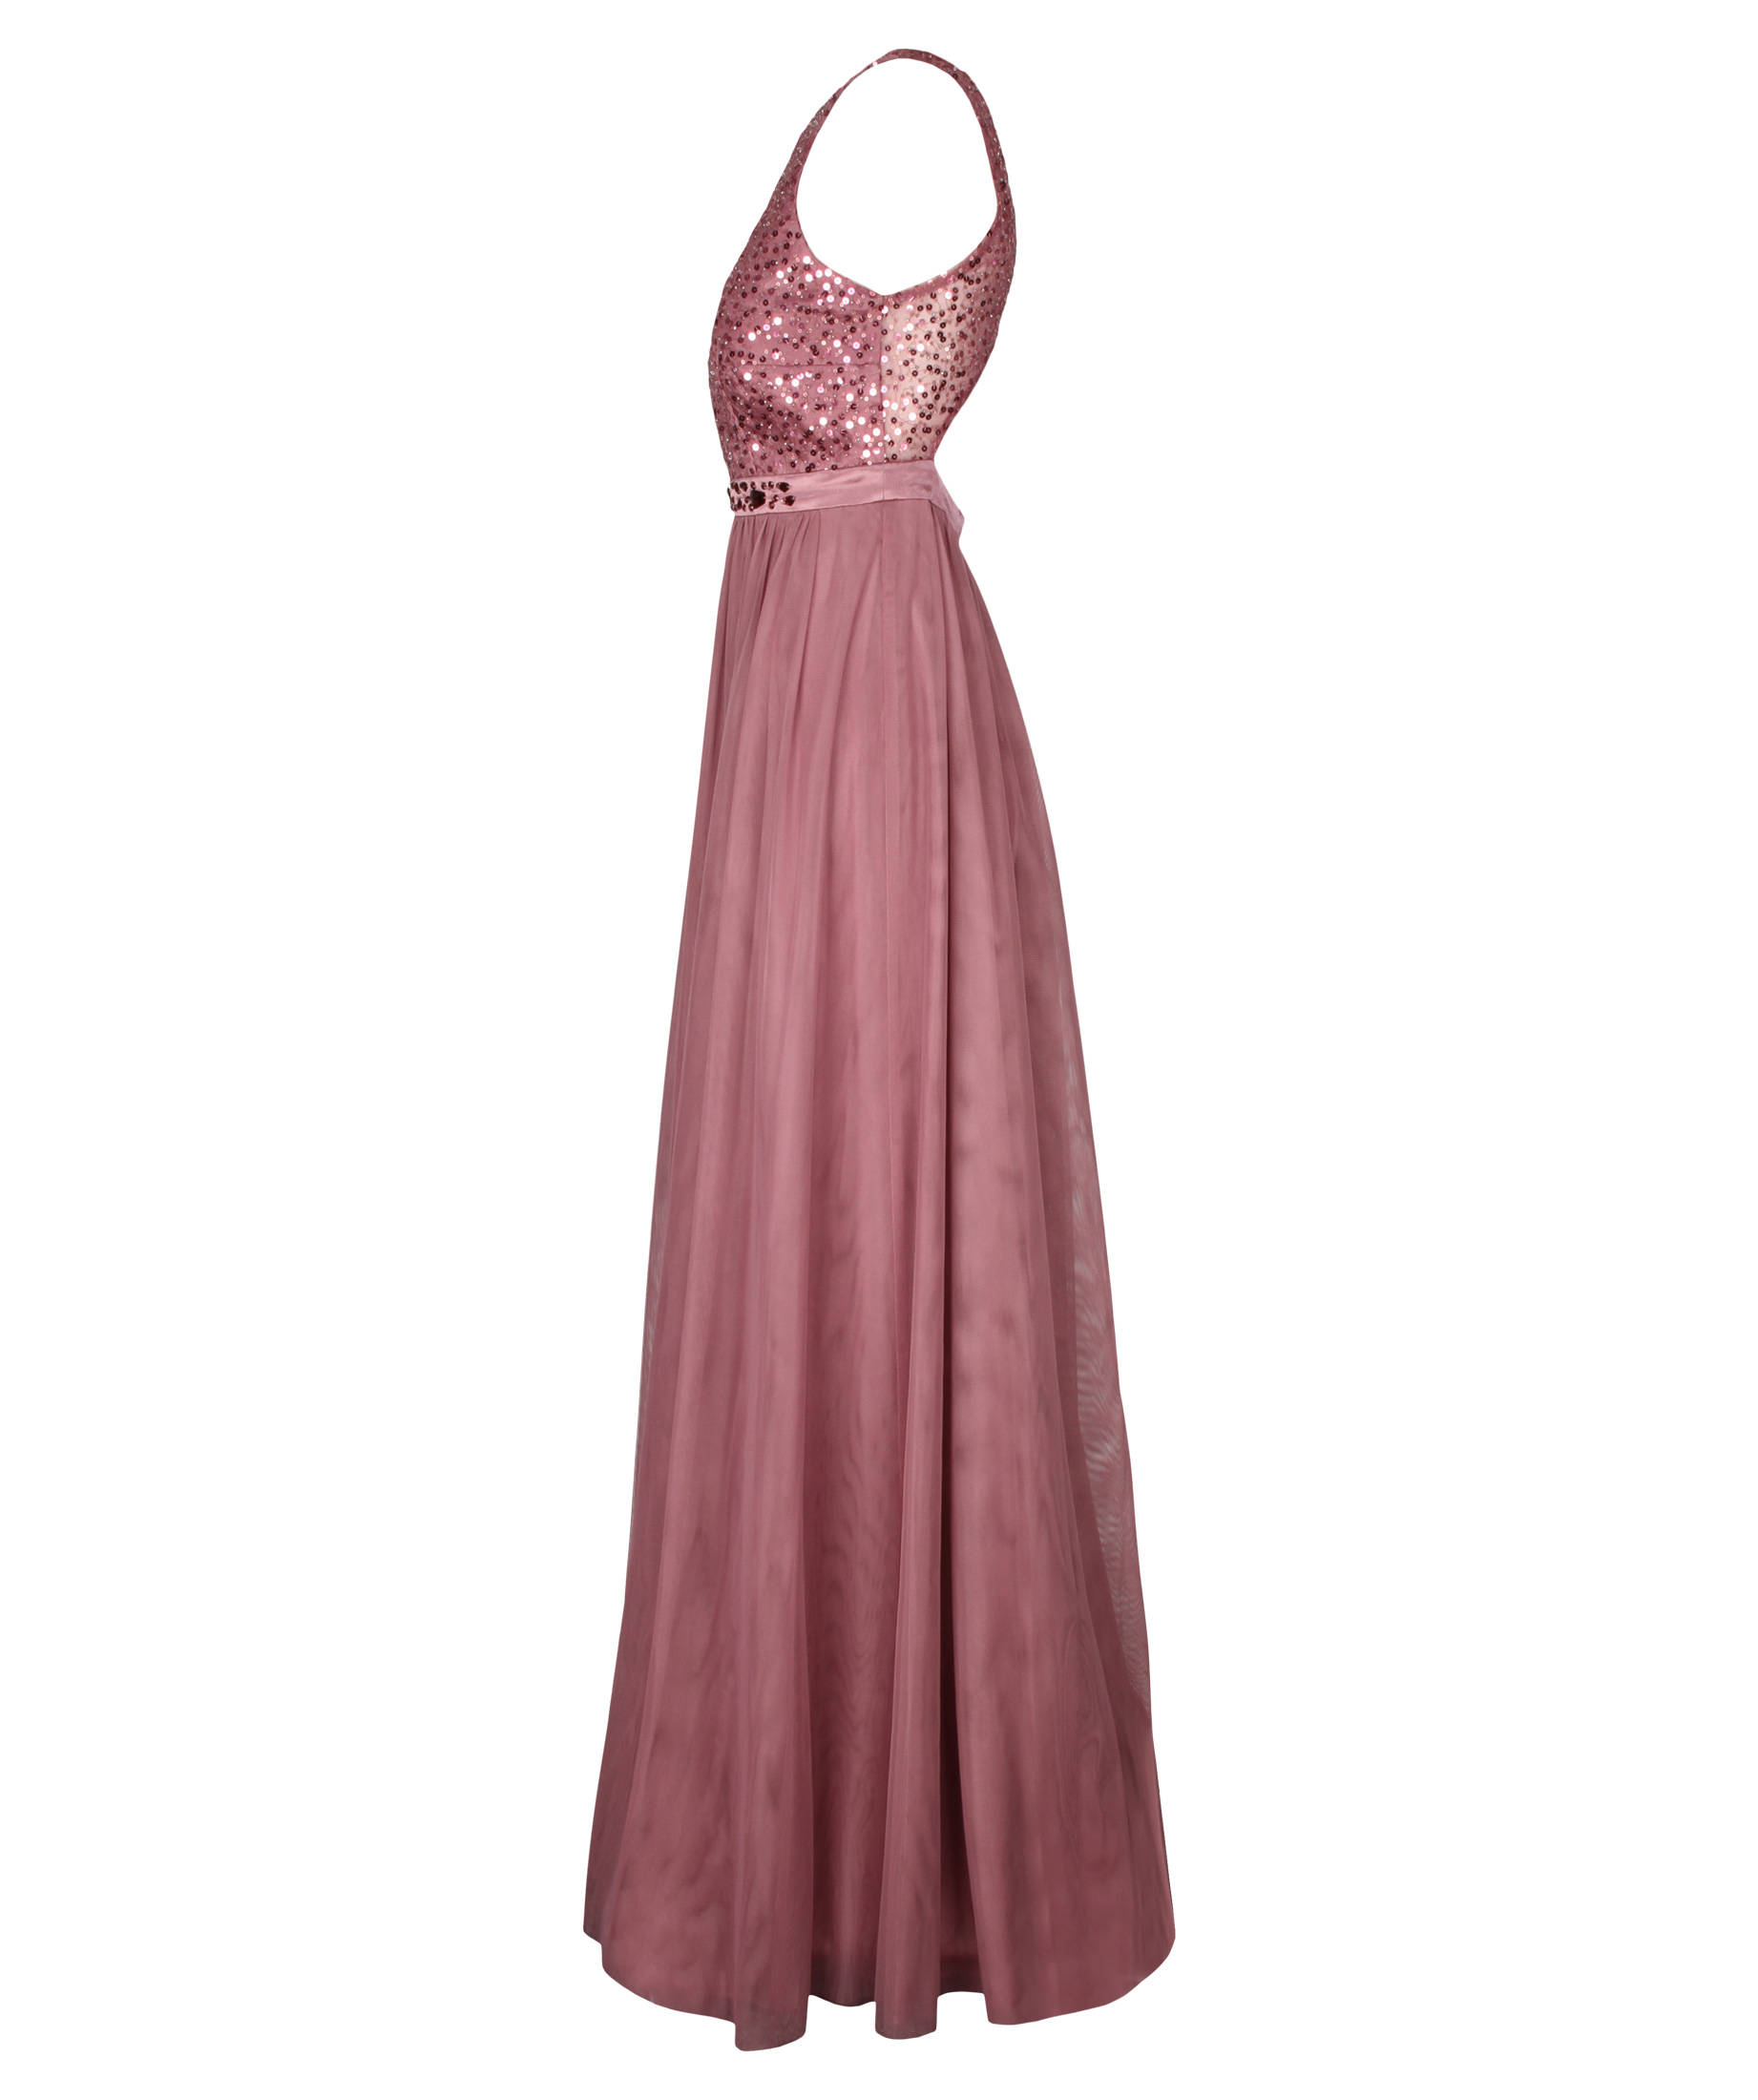 VM Vera Mont Damen Abendkleid Ärmellos